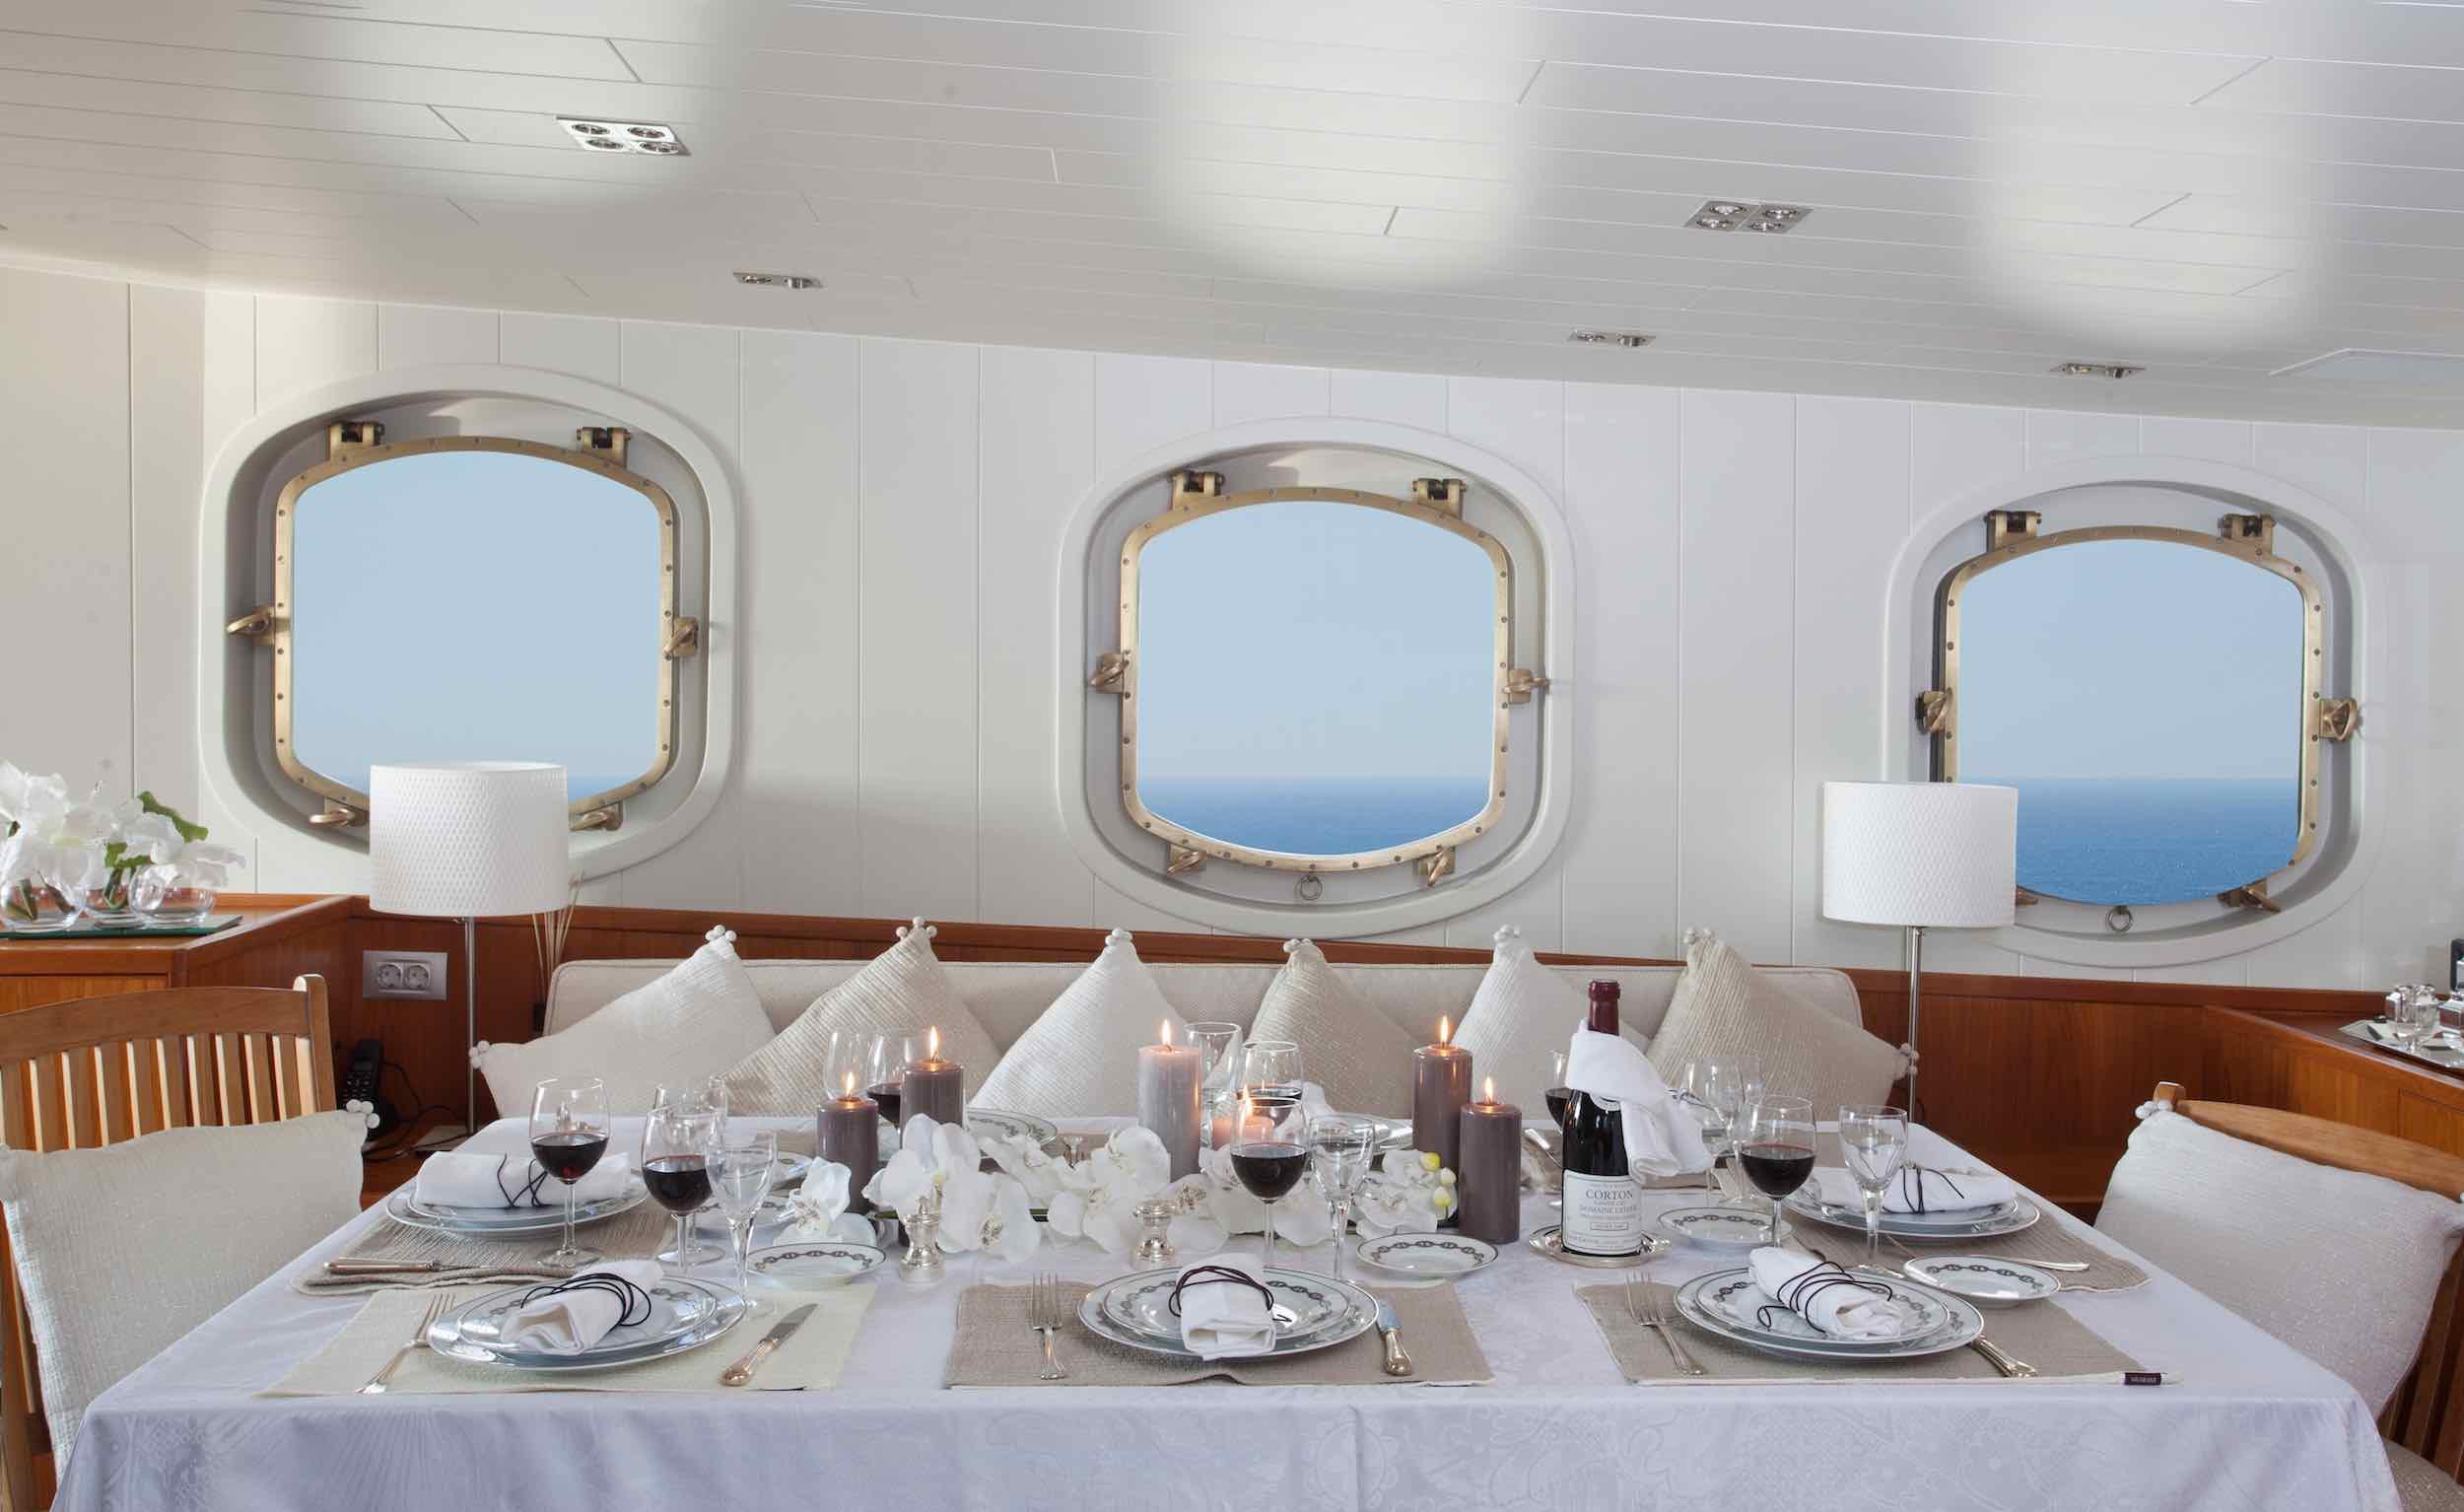 motor yacht Drenec dining table II.jpeg